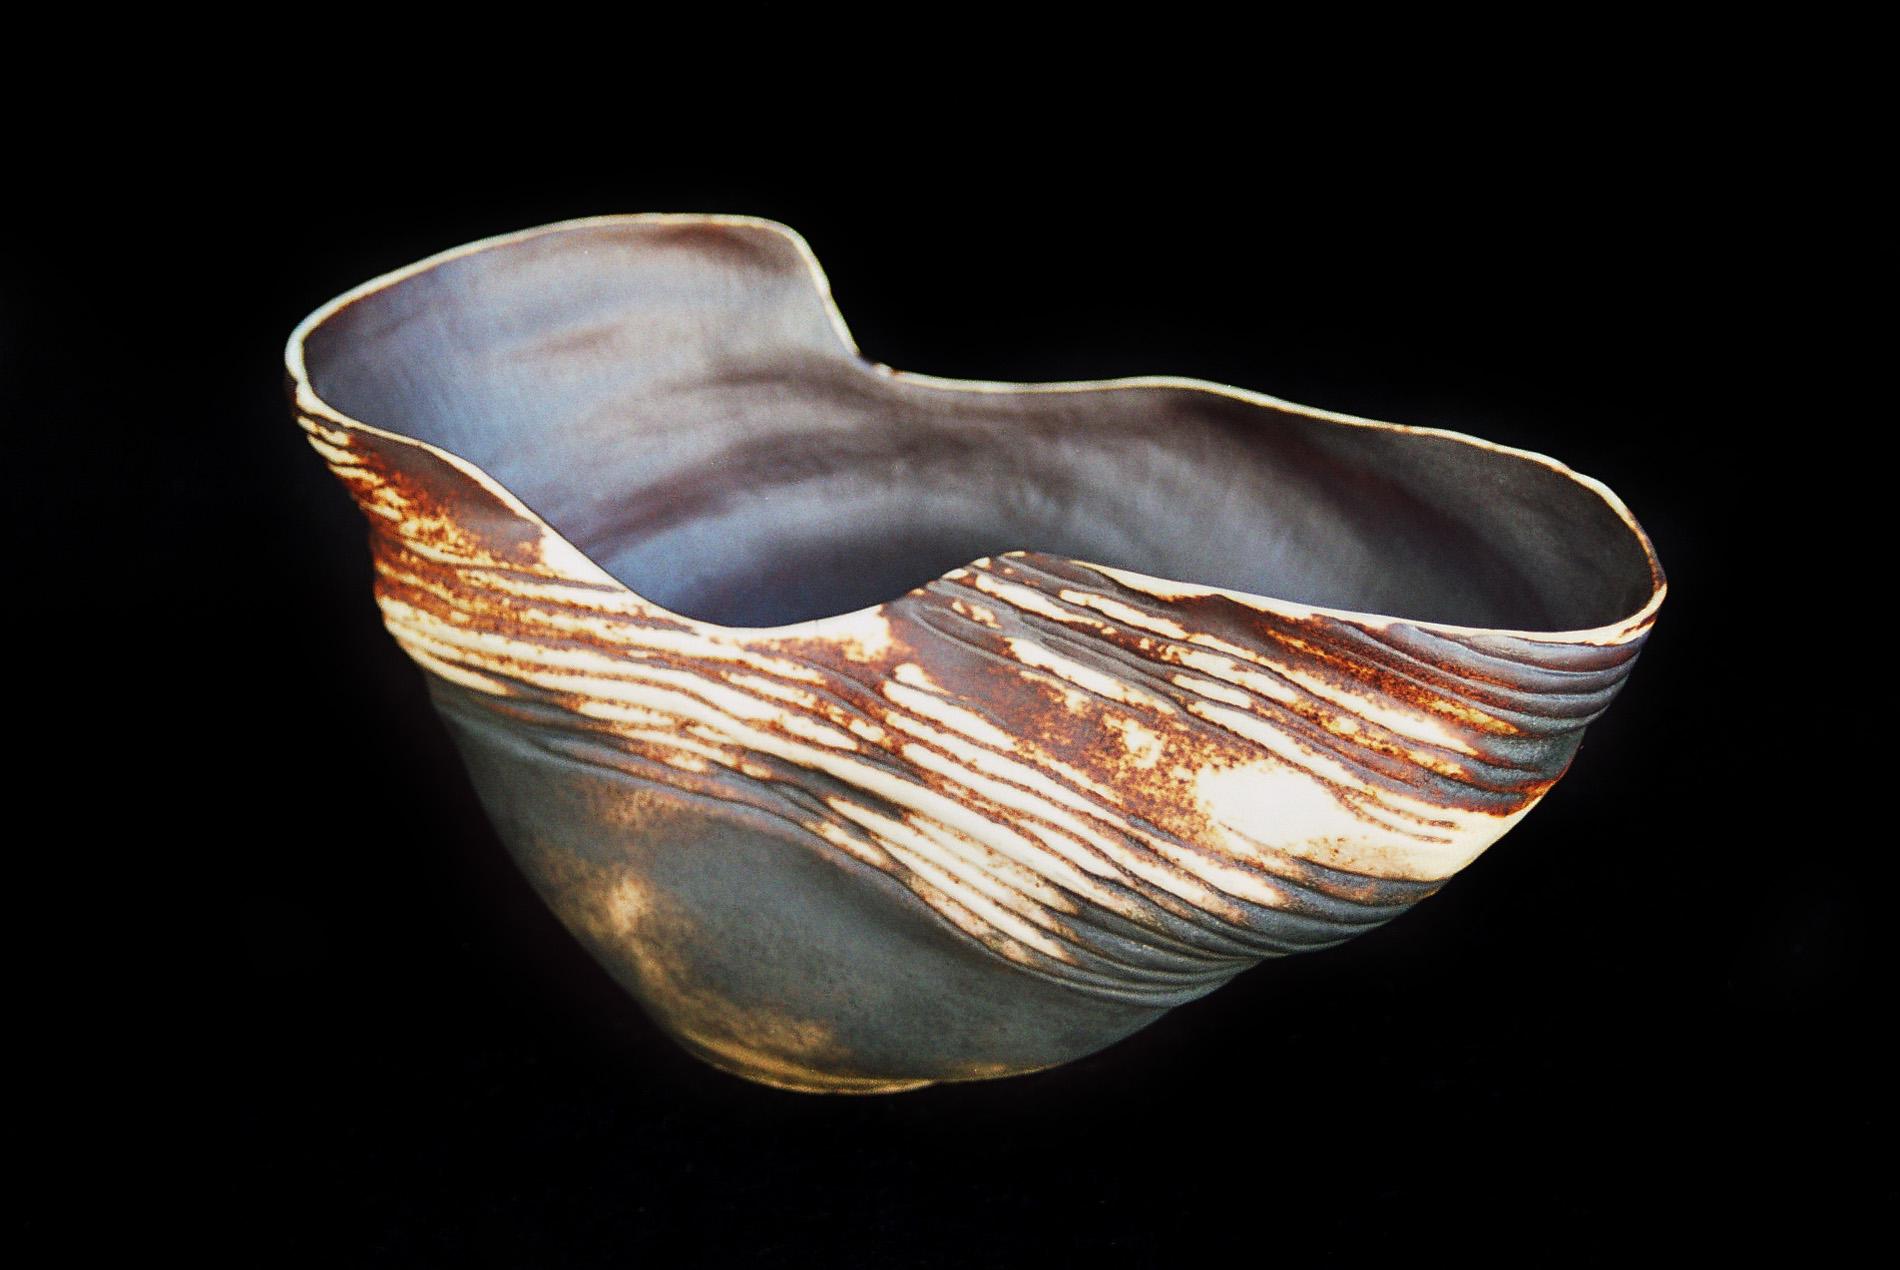 Palkó Ernő • Antique object • coloured porcelain 1300 °C • 24×35×22 cm